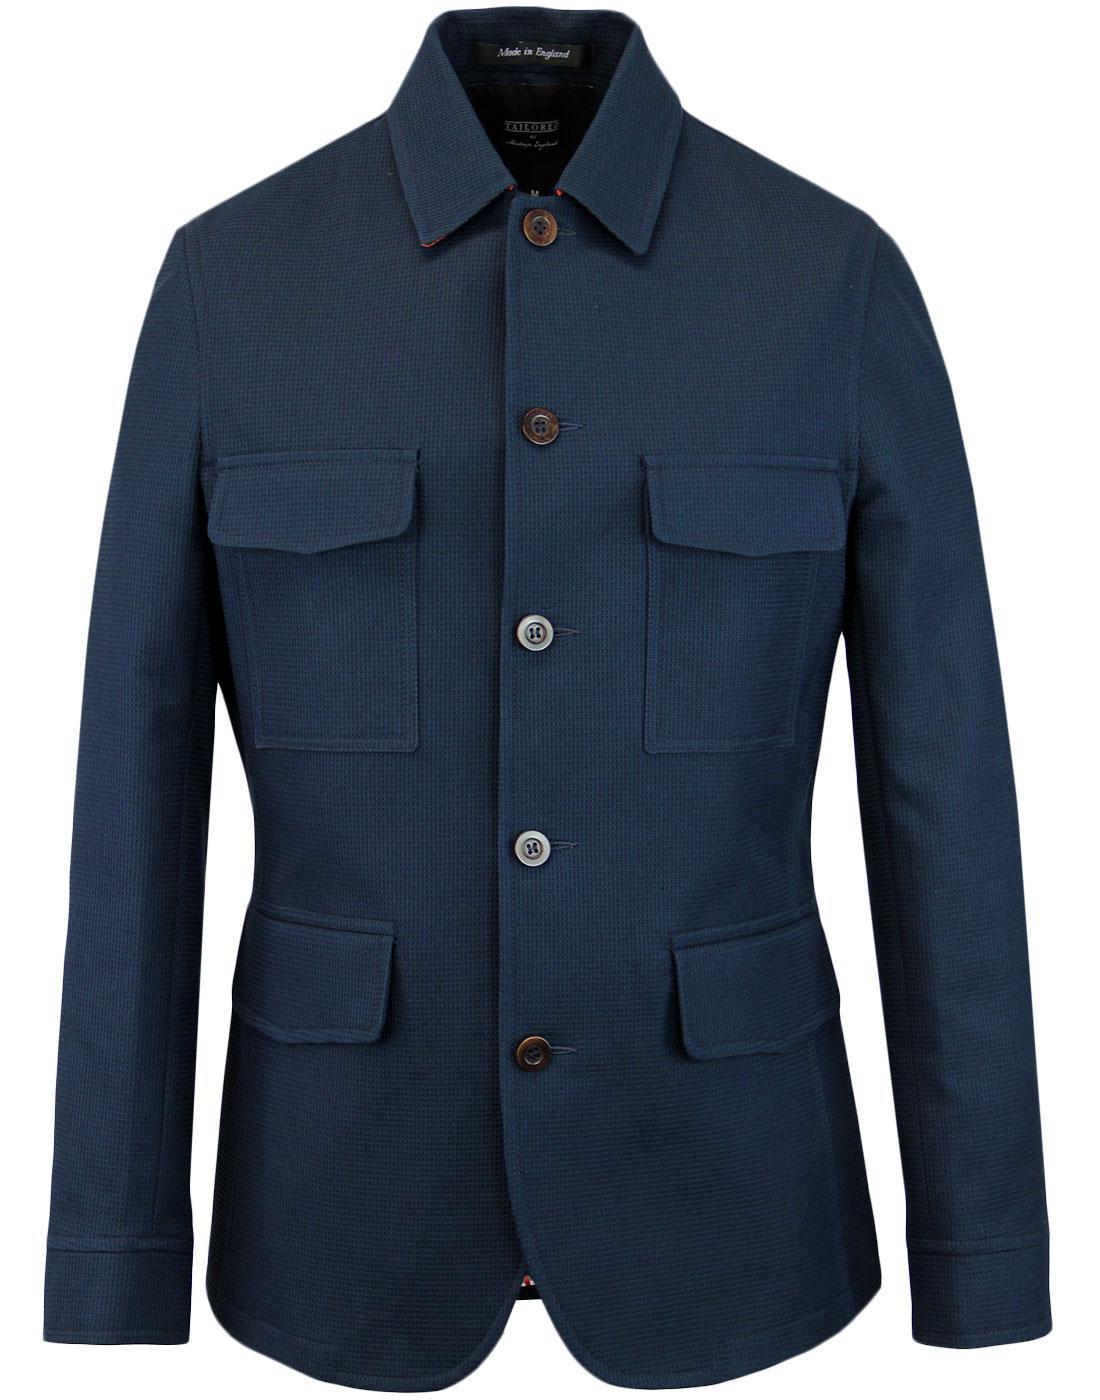 Bakerboy MADCAP ENGLAND Made in England Jacket (N)